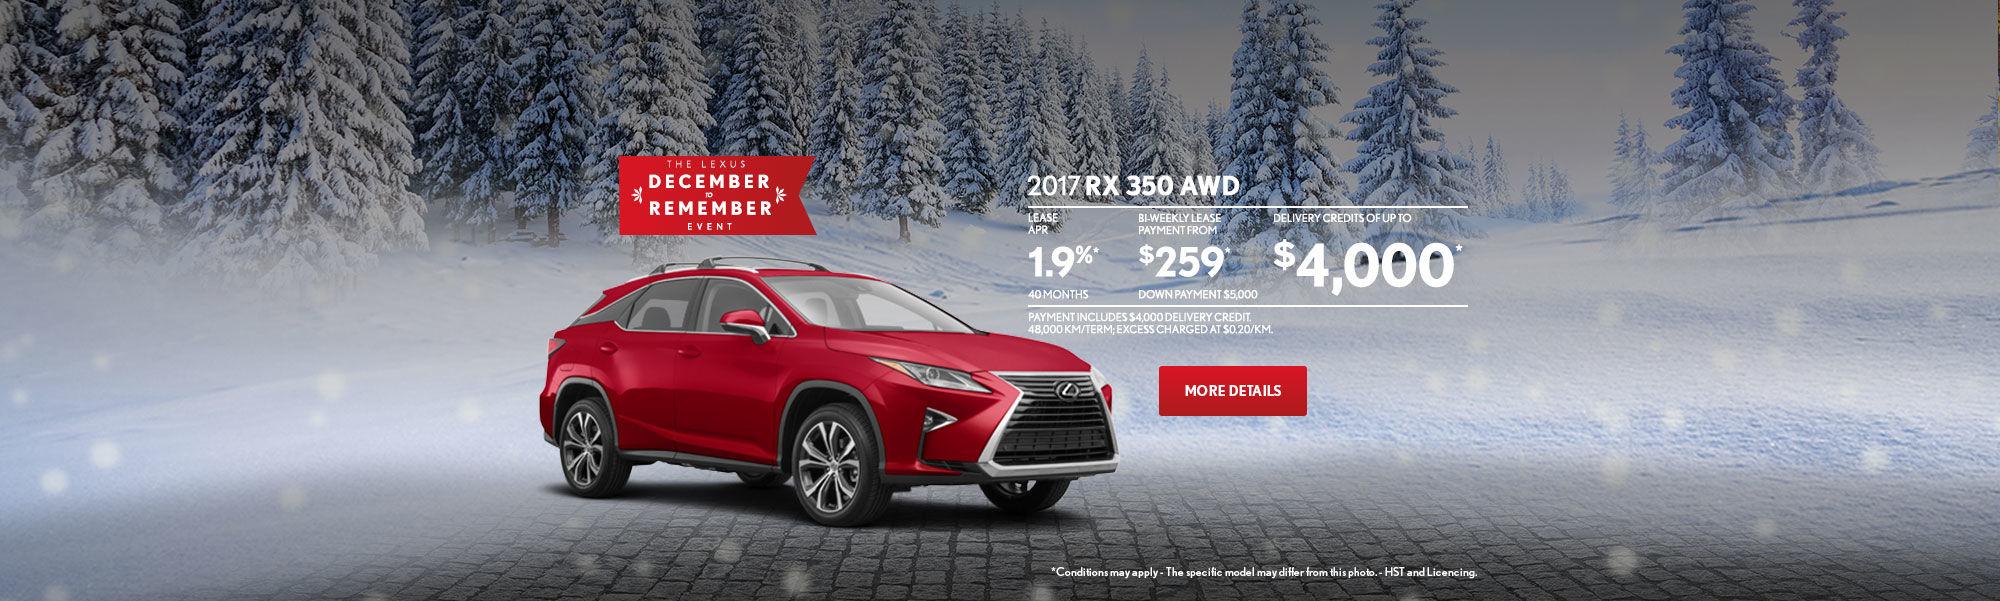 Lexus RX December